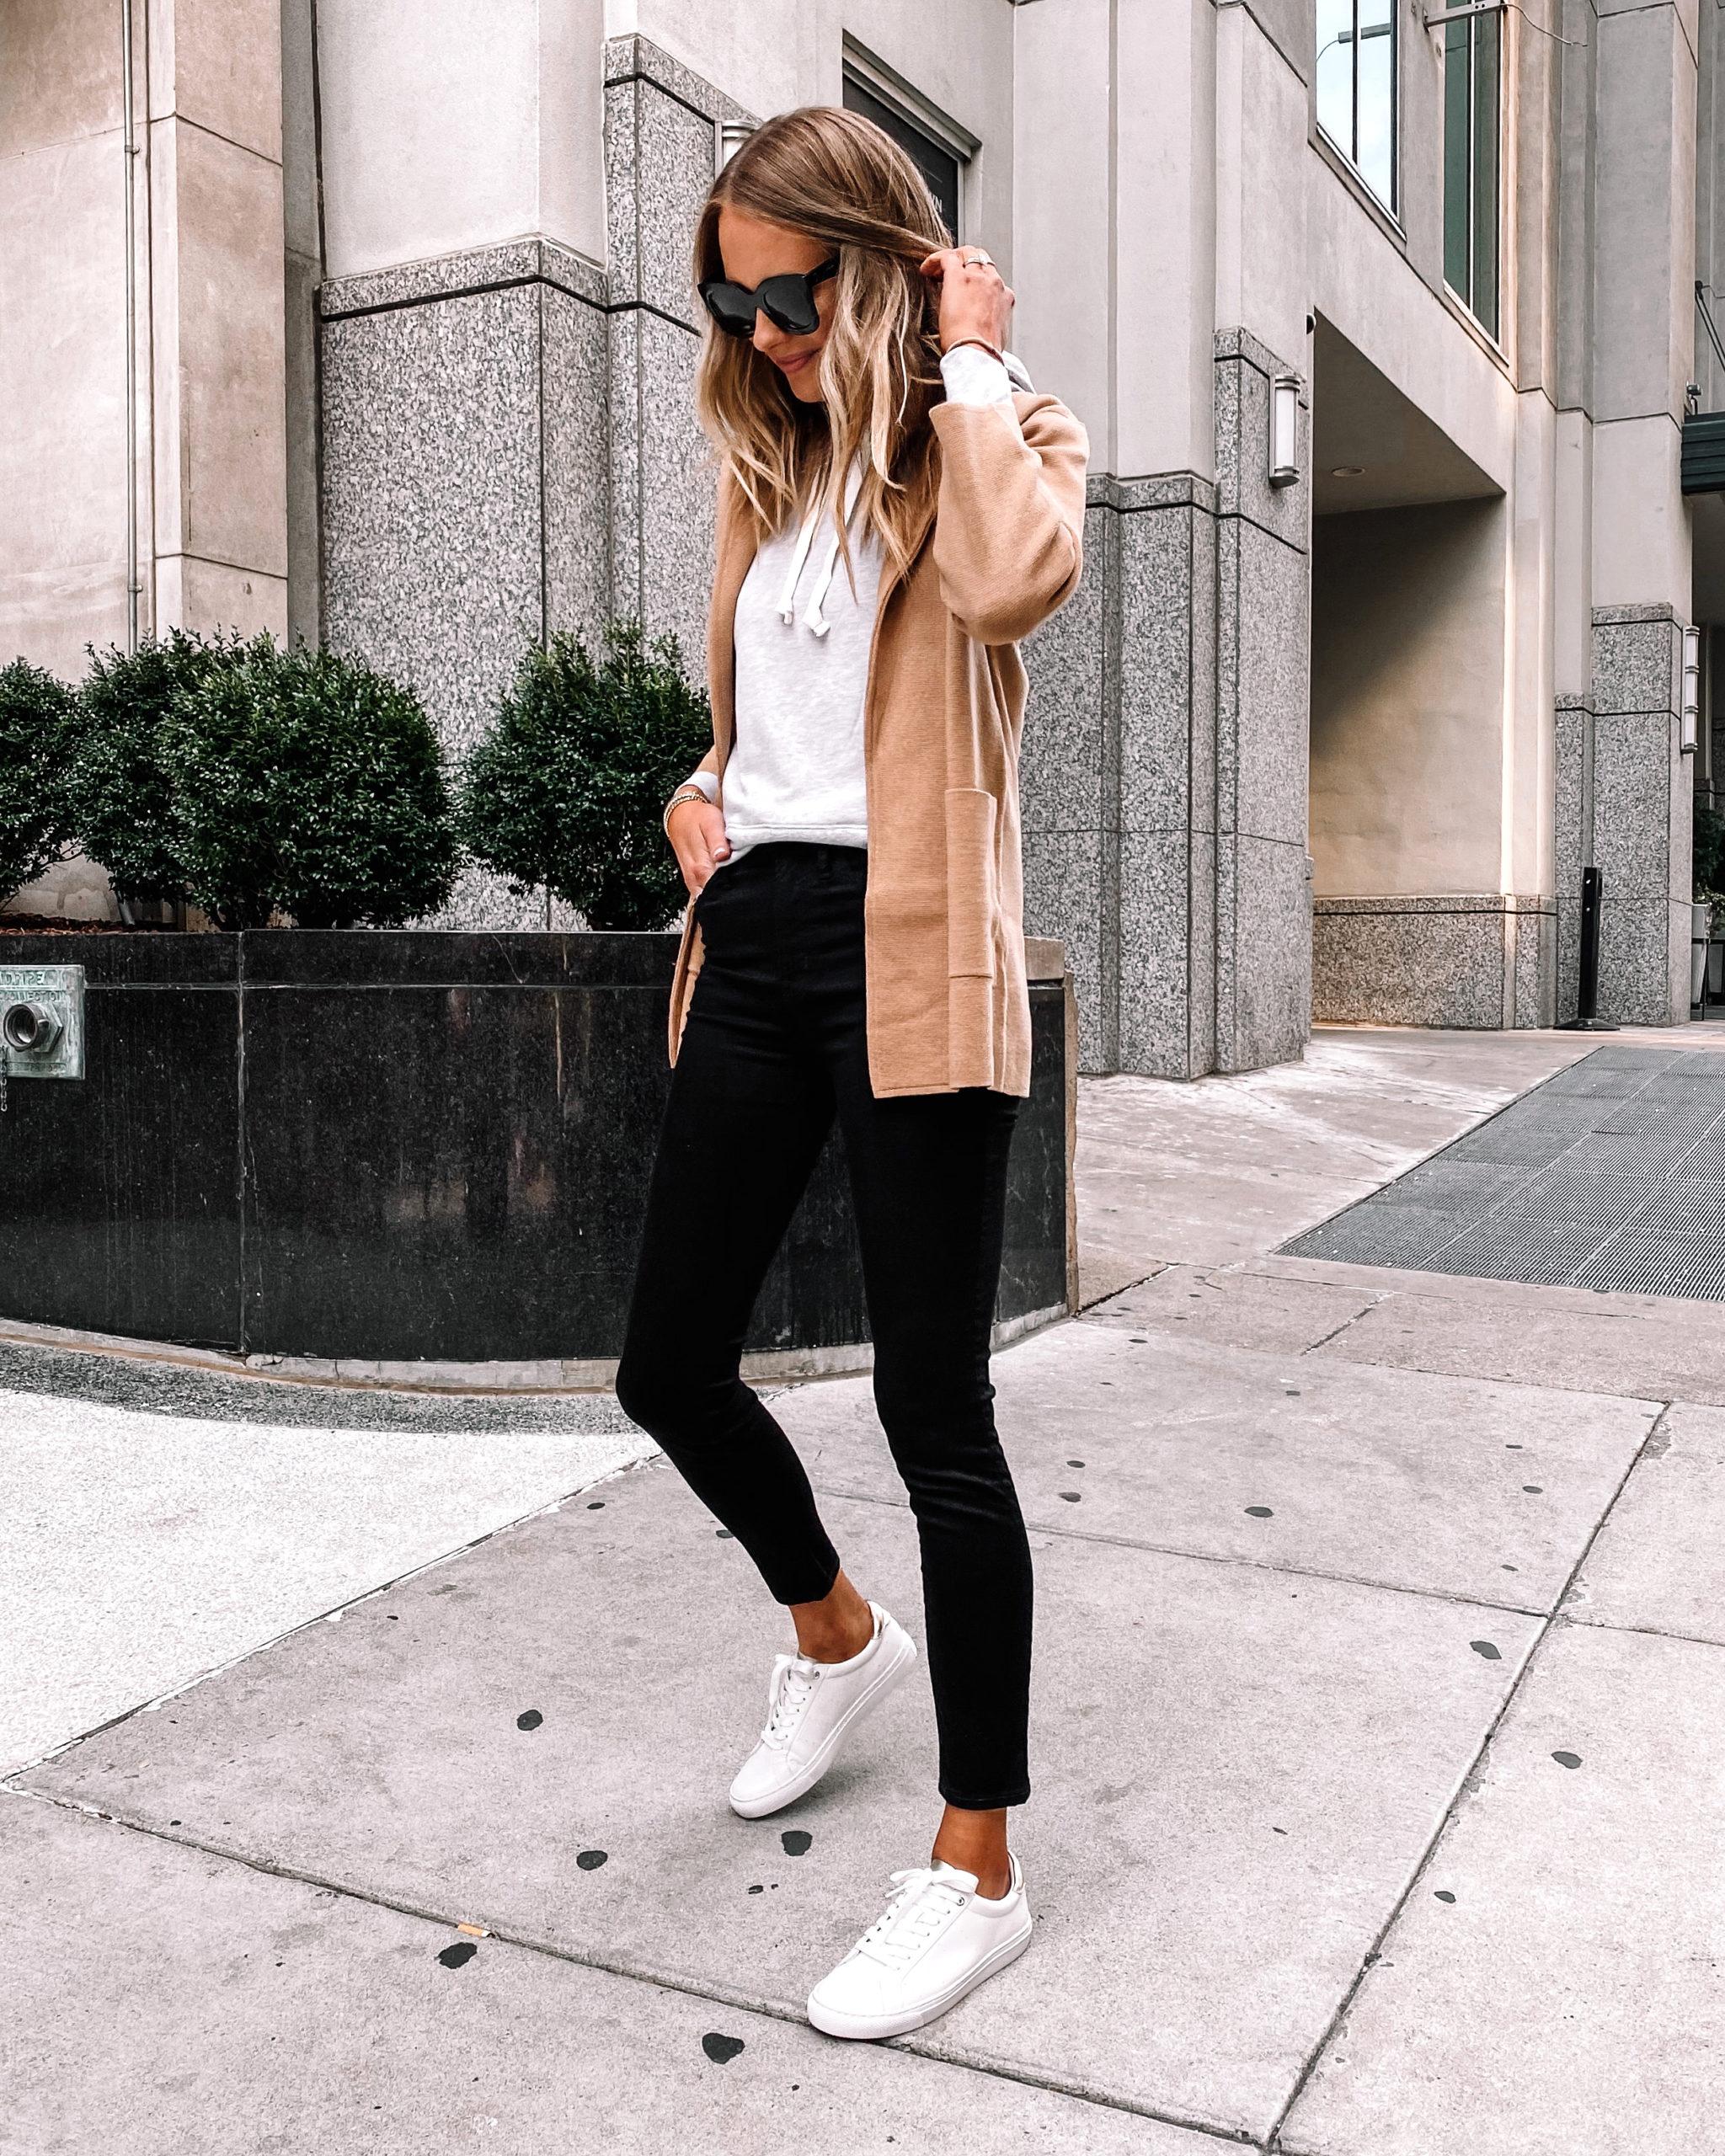 Fashion Jackson Wearing Jcrew Camel Sweater Blazer Grey Hoodie Sweatshirt Black Skinny Jeans White Sneakers